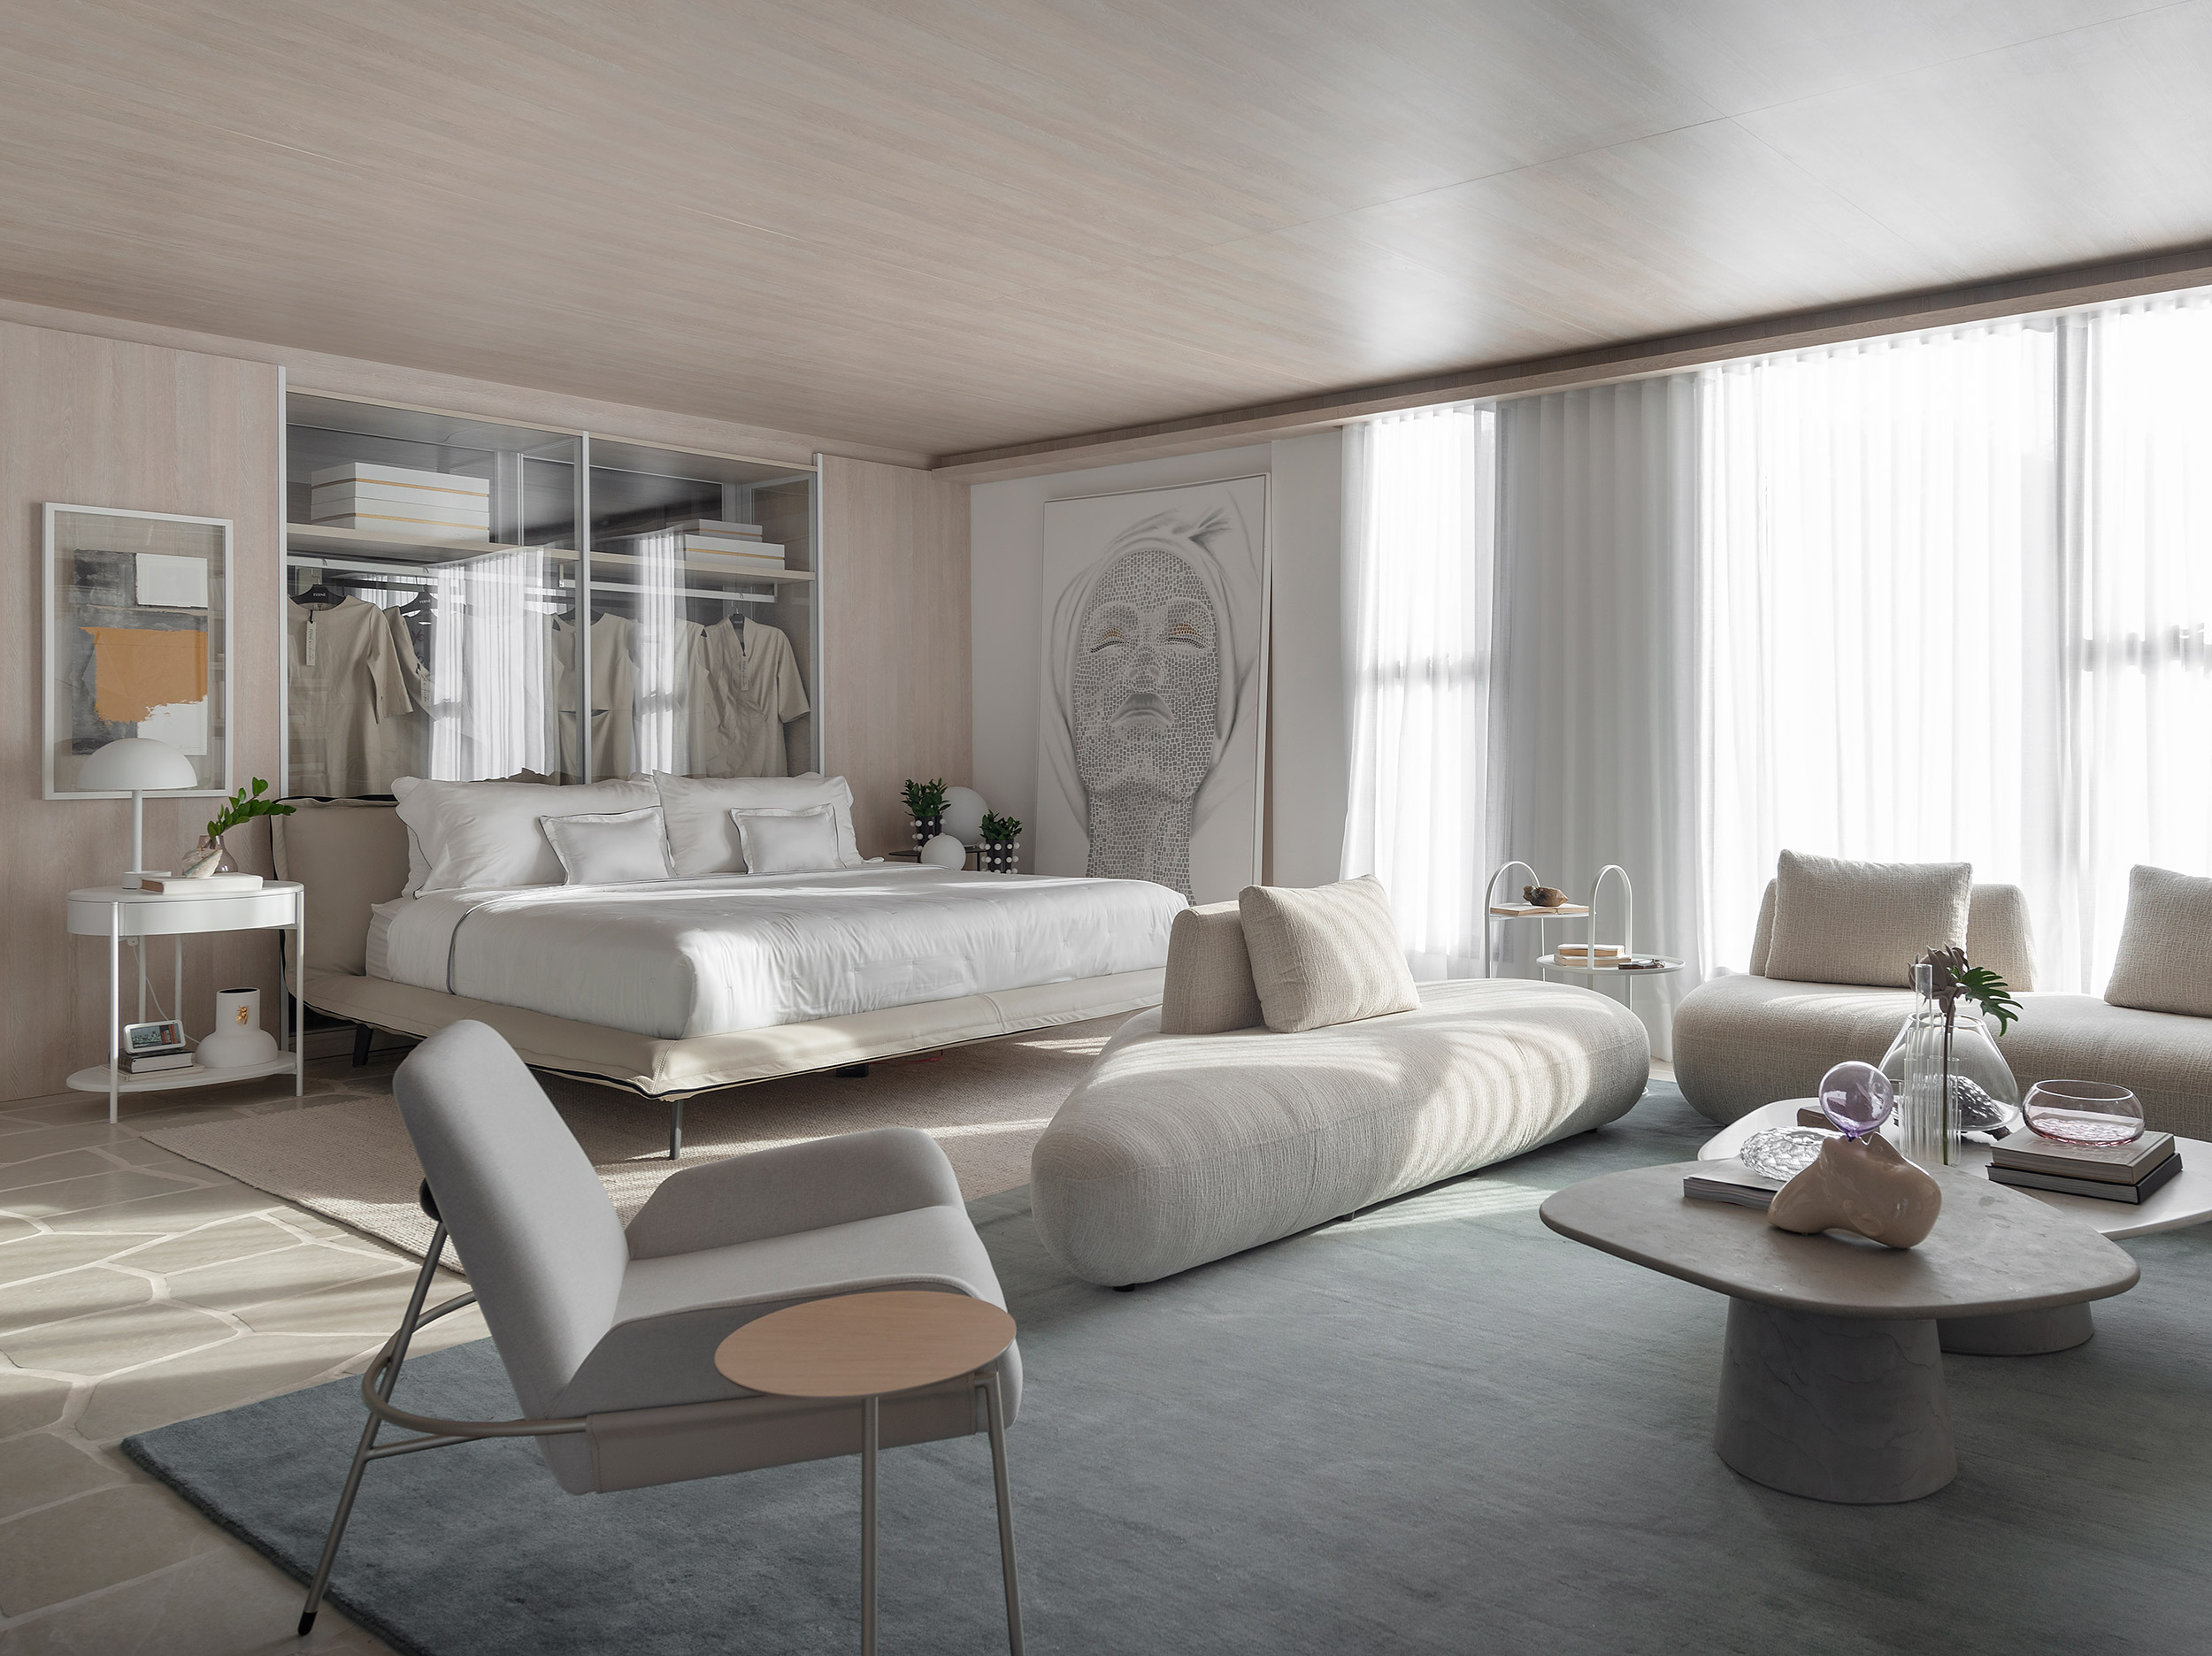 Cosmopolitan Loft - Mariana Pesca Arquitetura